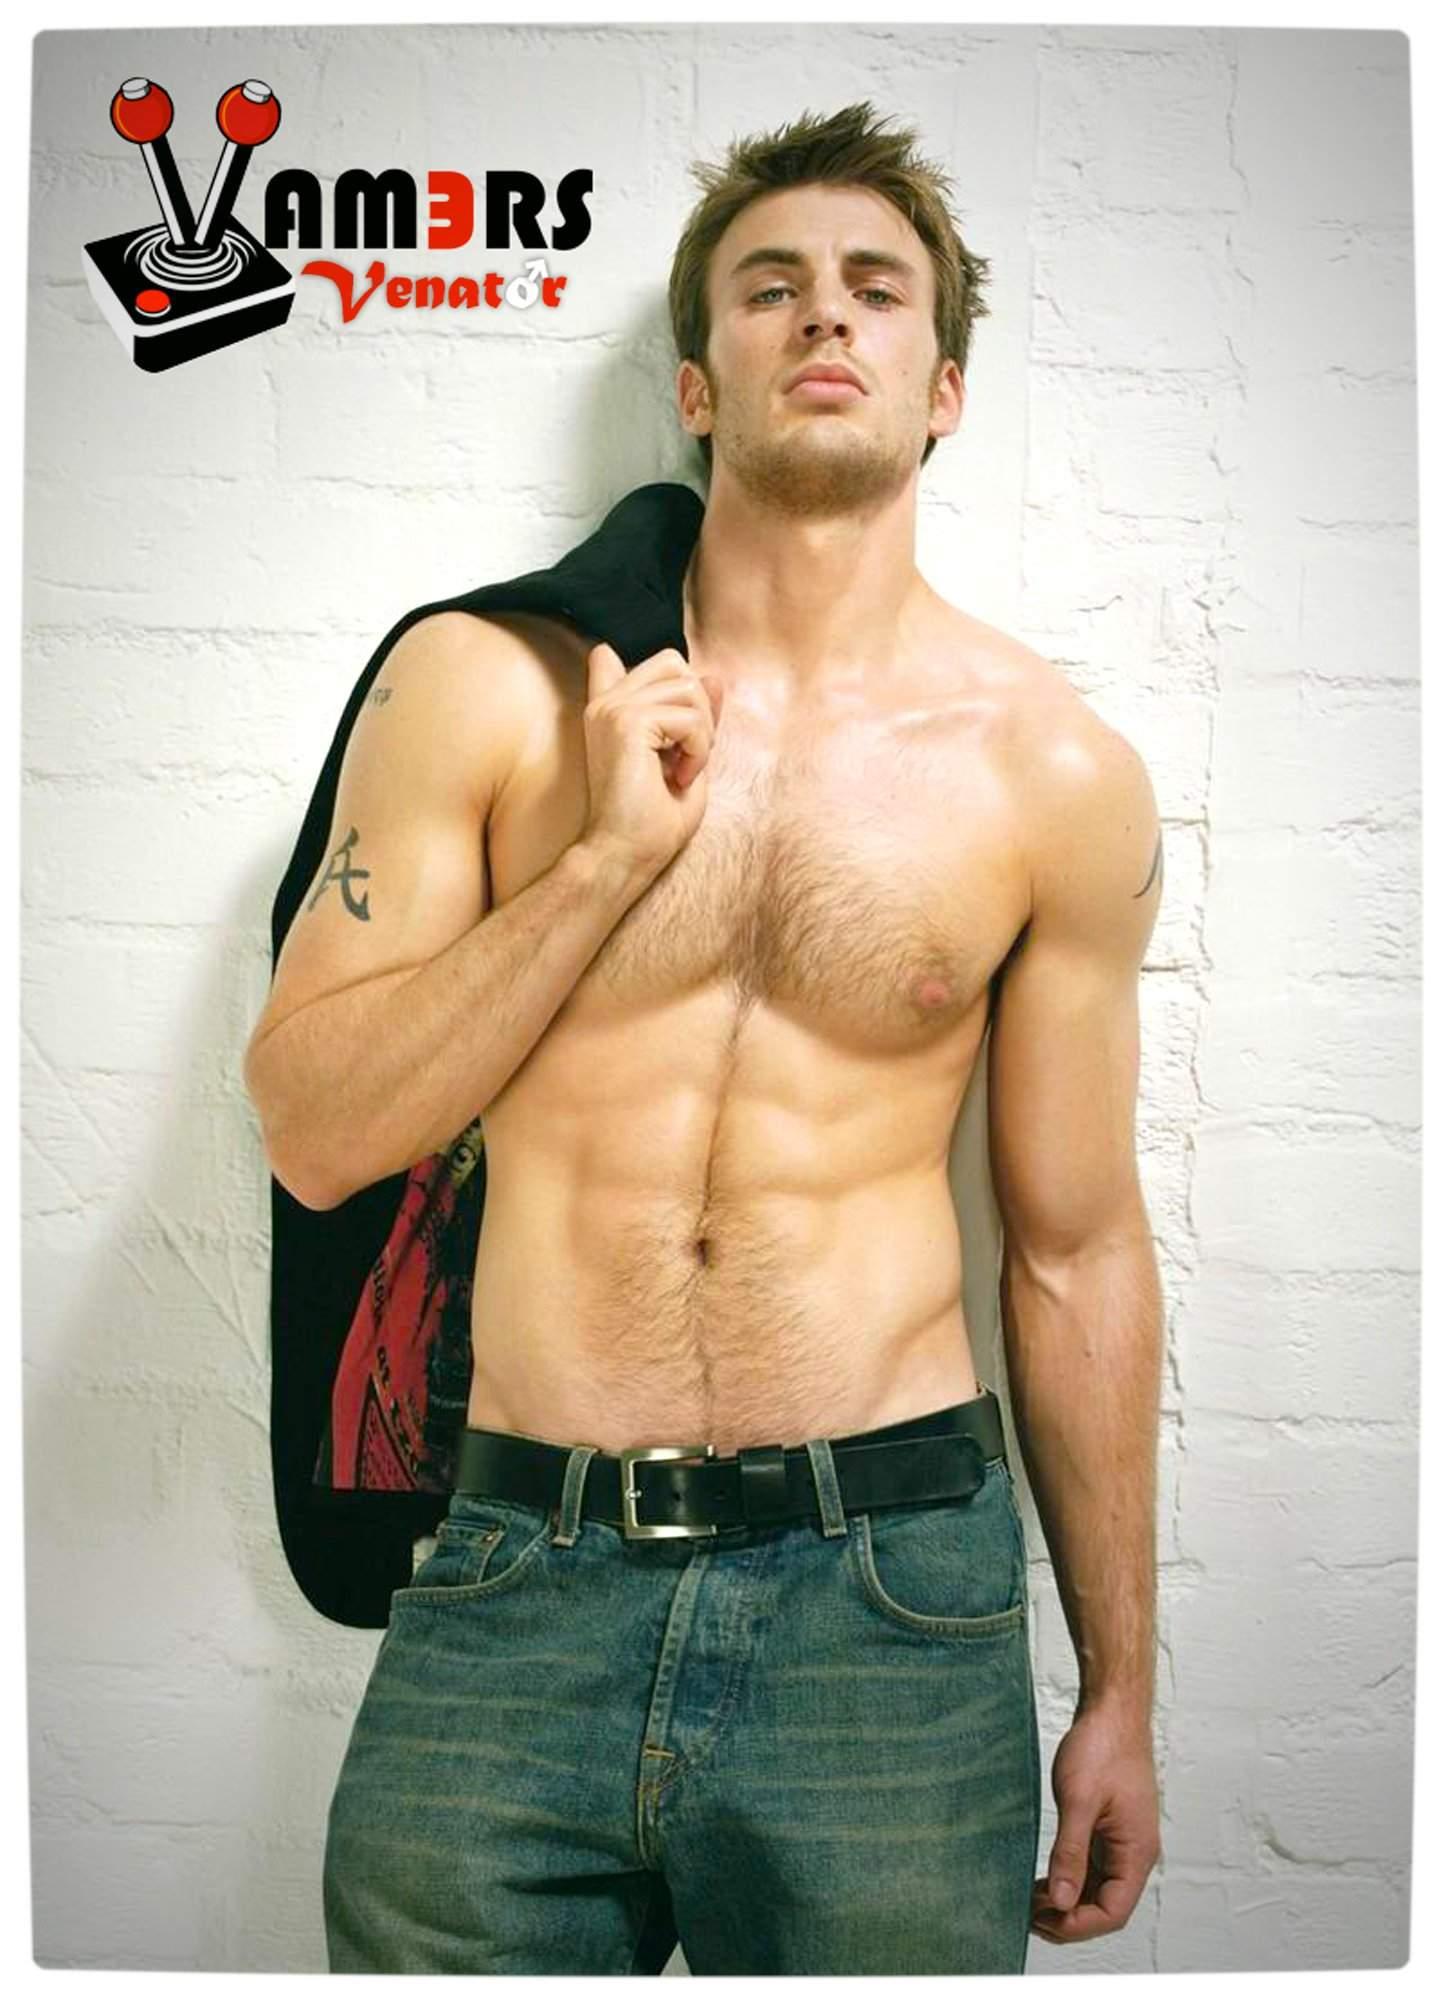 Vamers Venator for March 2014: Chris Evans.